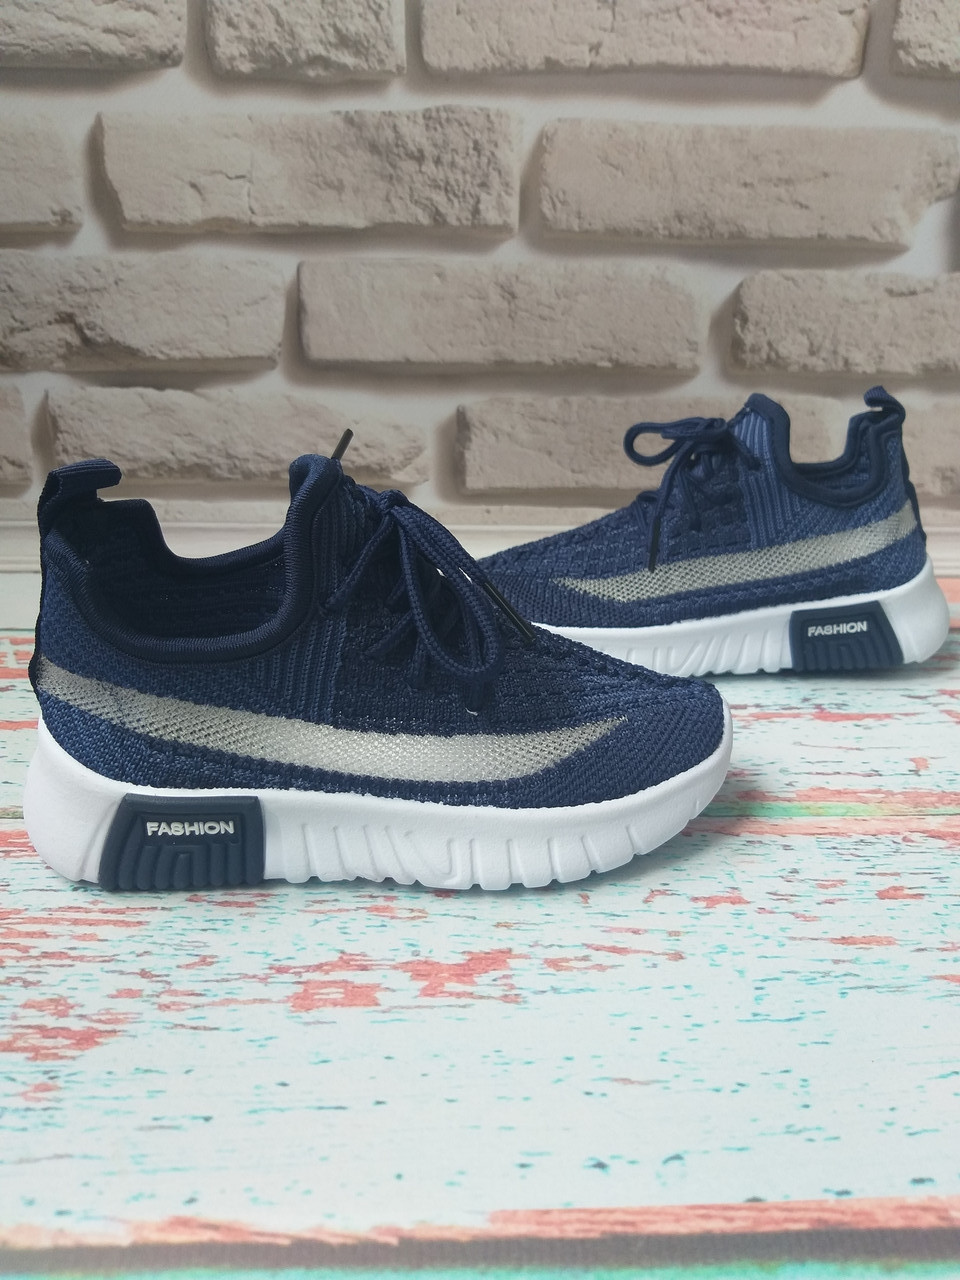 Детские летние синие кроссовки на мальчика сетка 30 размер